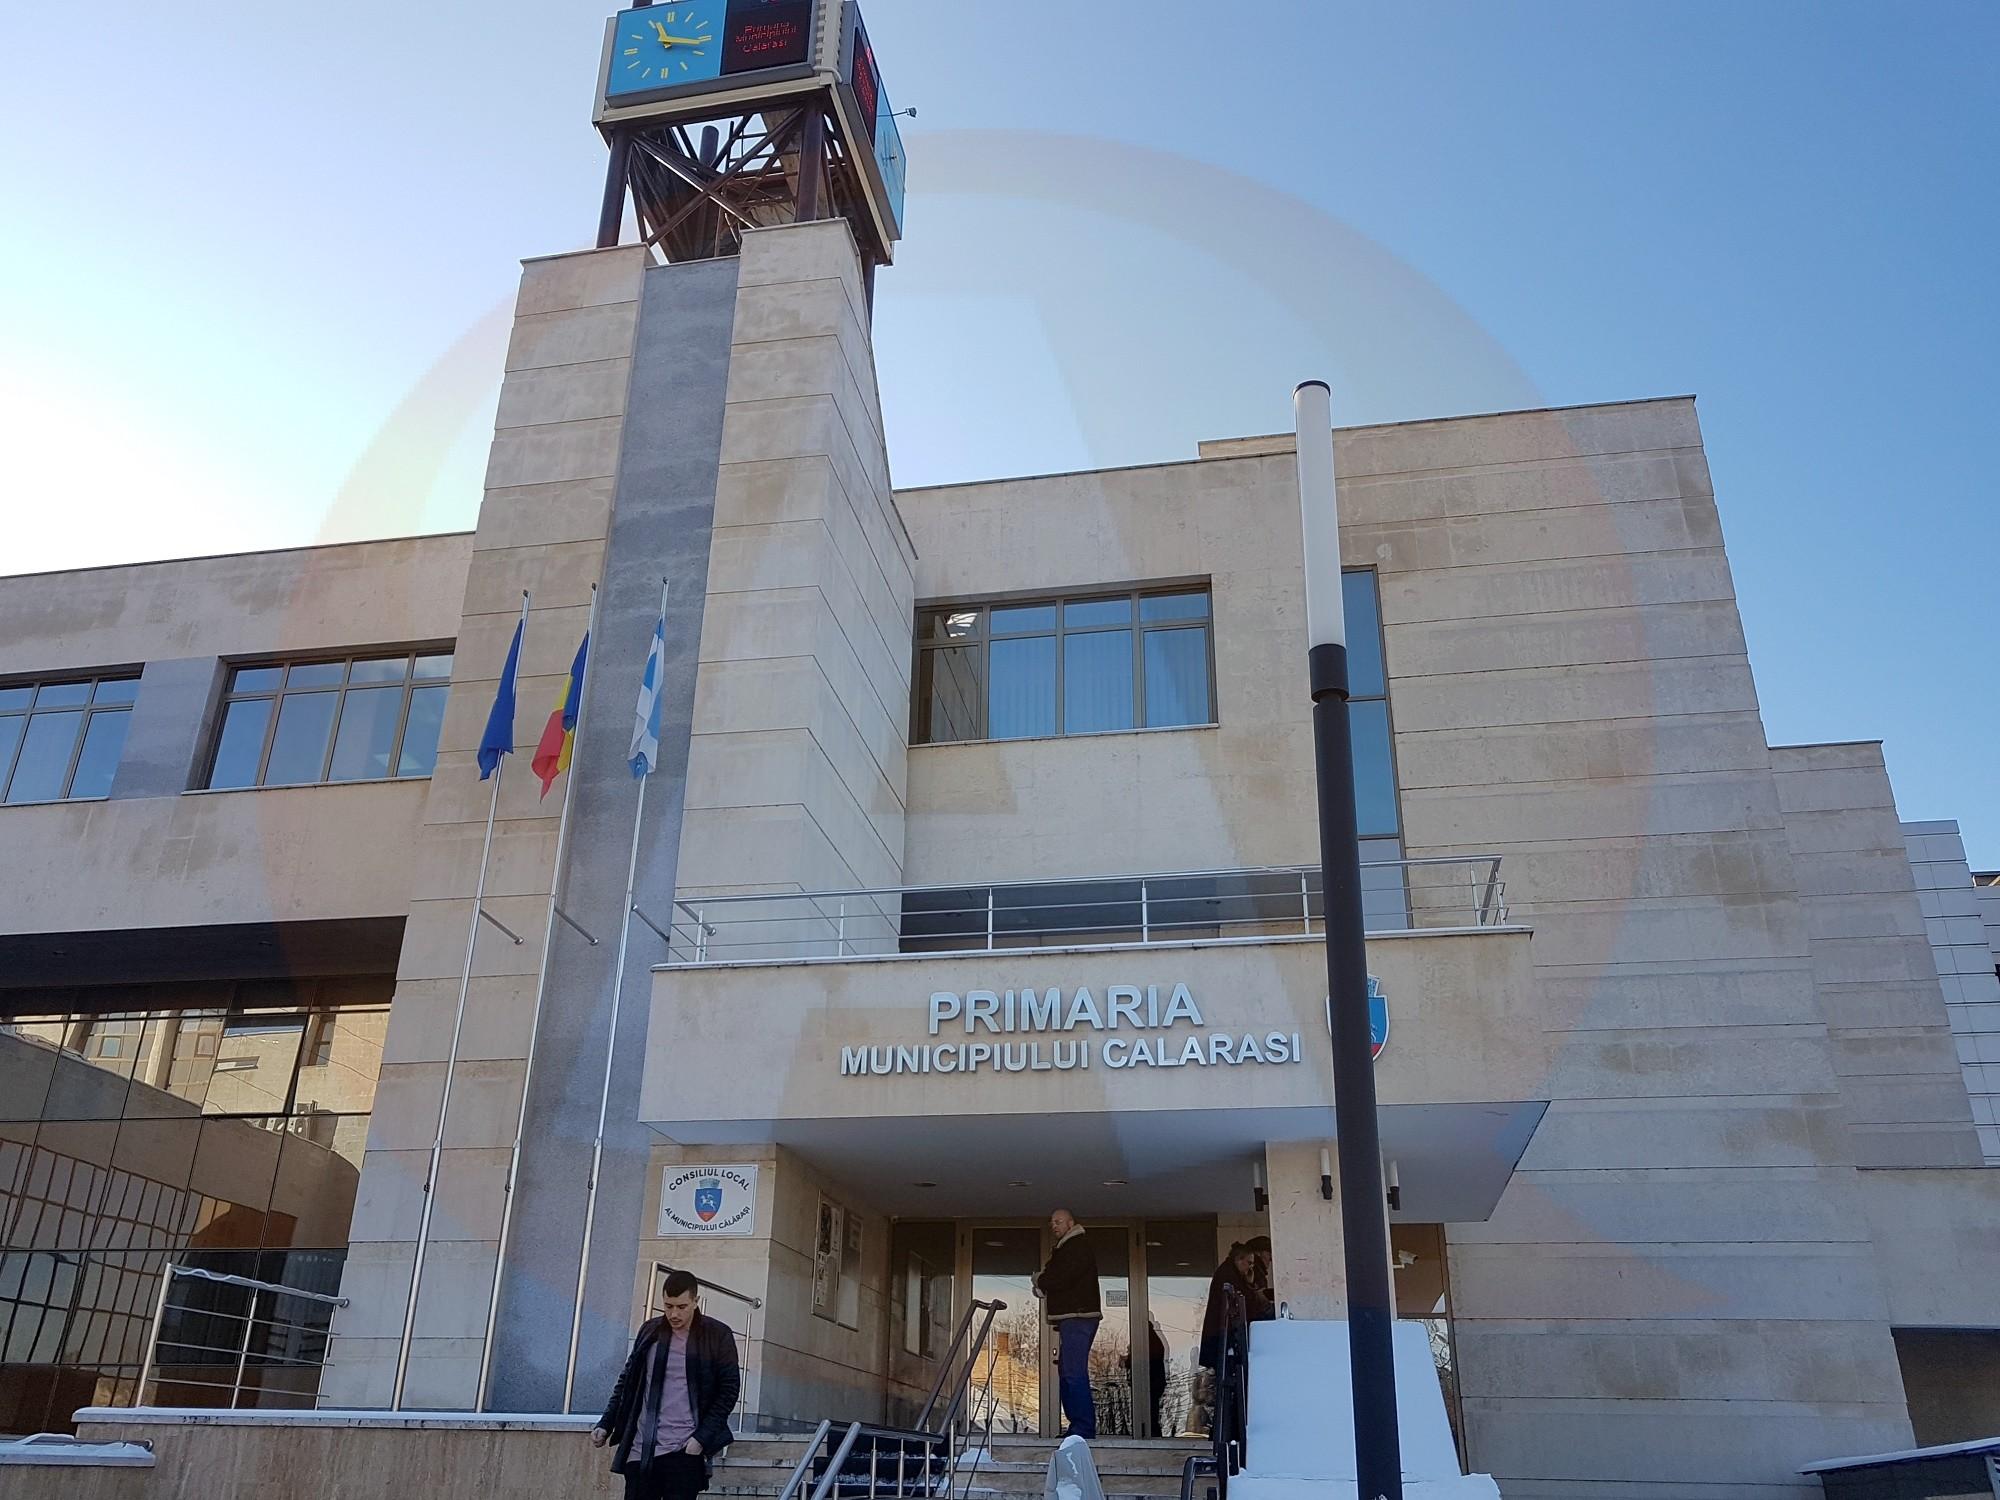 Primaria Calarasi/ANUNT DE LICITAŢIE